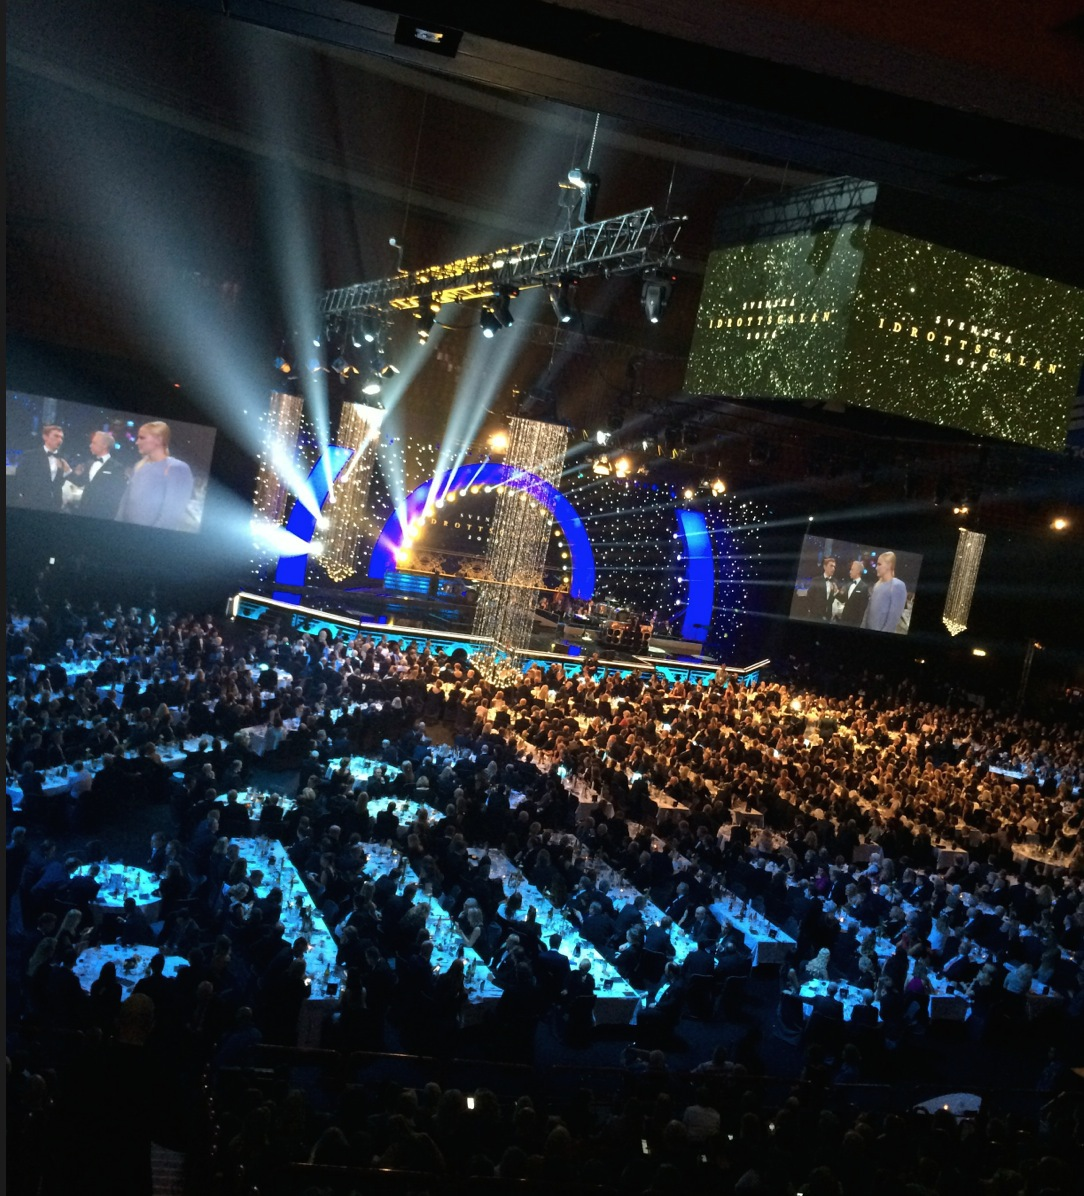 Sveriges maffigaste gala? 3 000 ätande gäster.